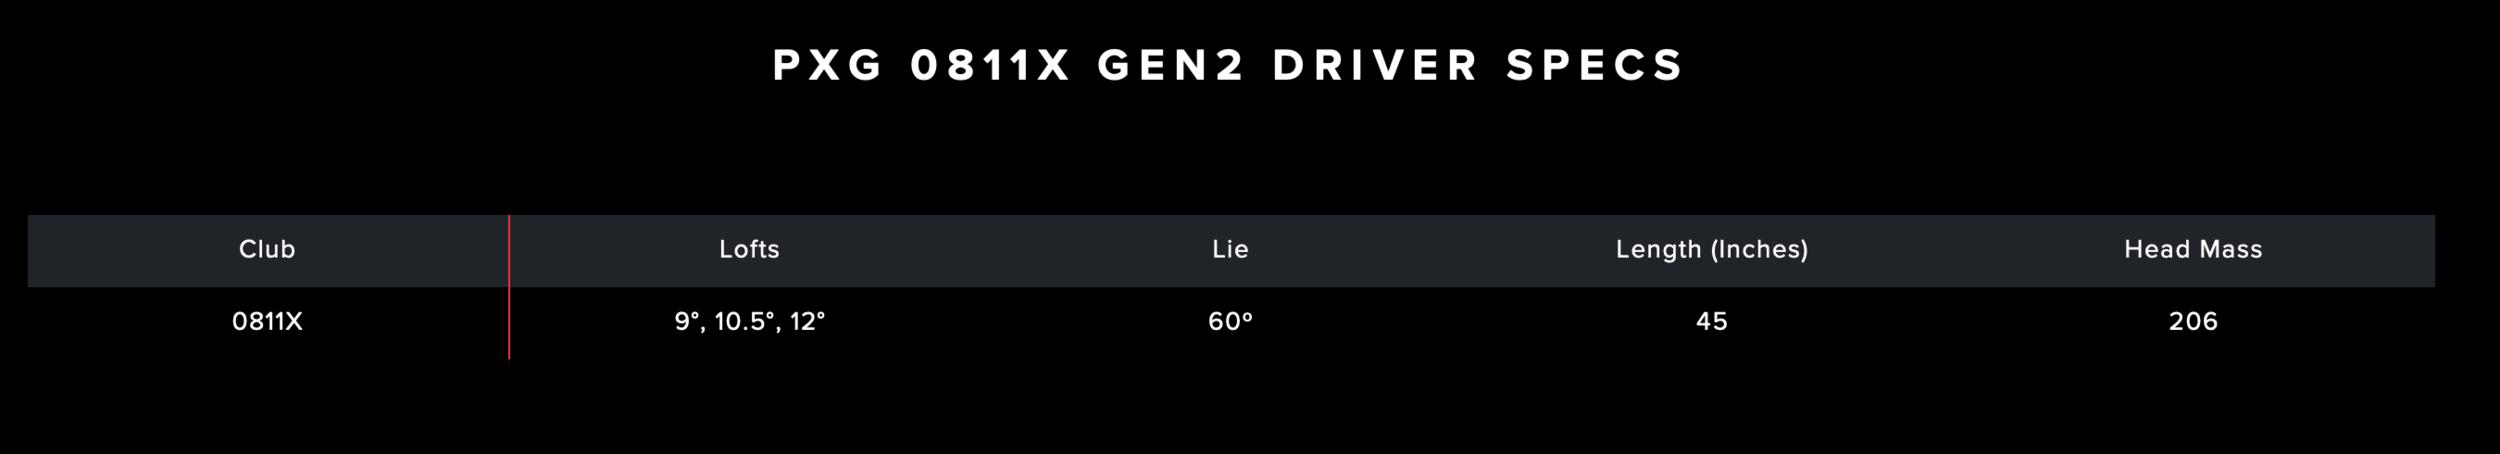 PXG 0811 Gen 2 Driver Spezifikationen.png